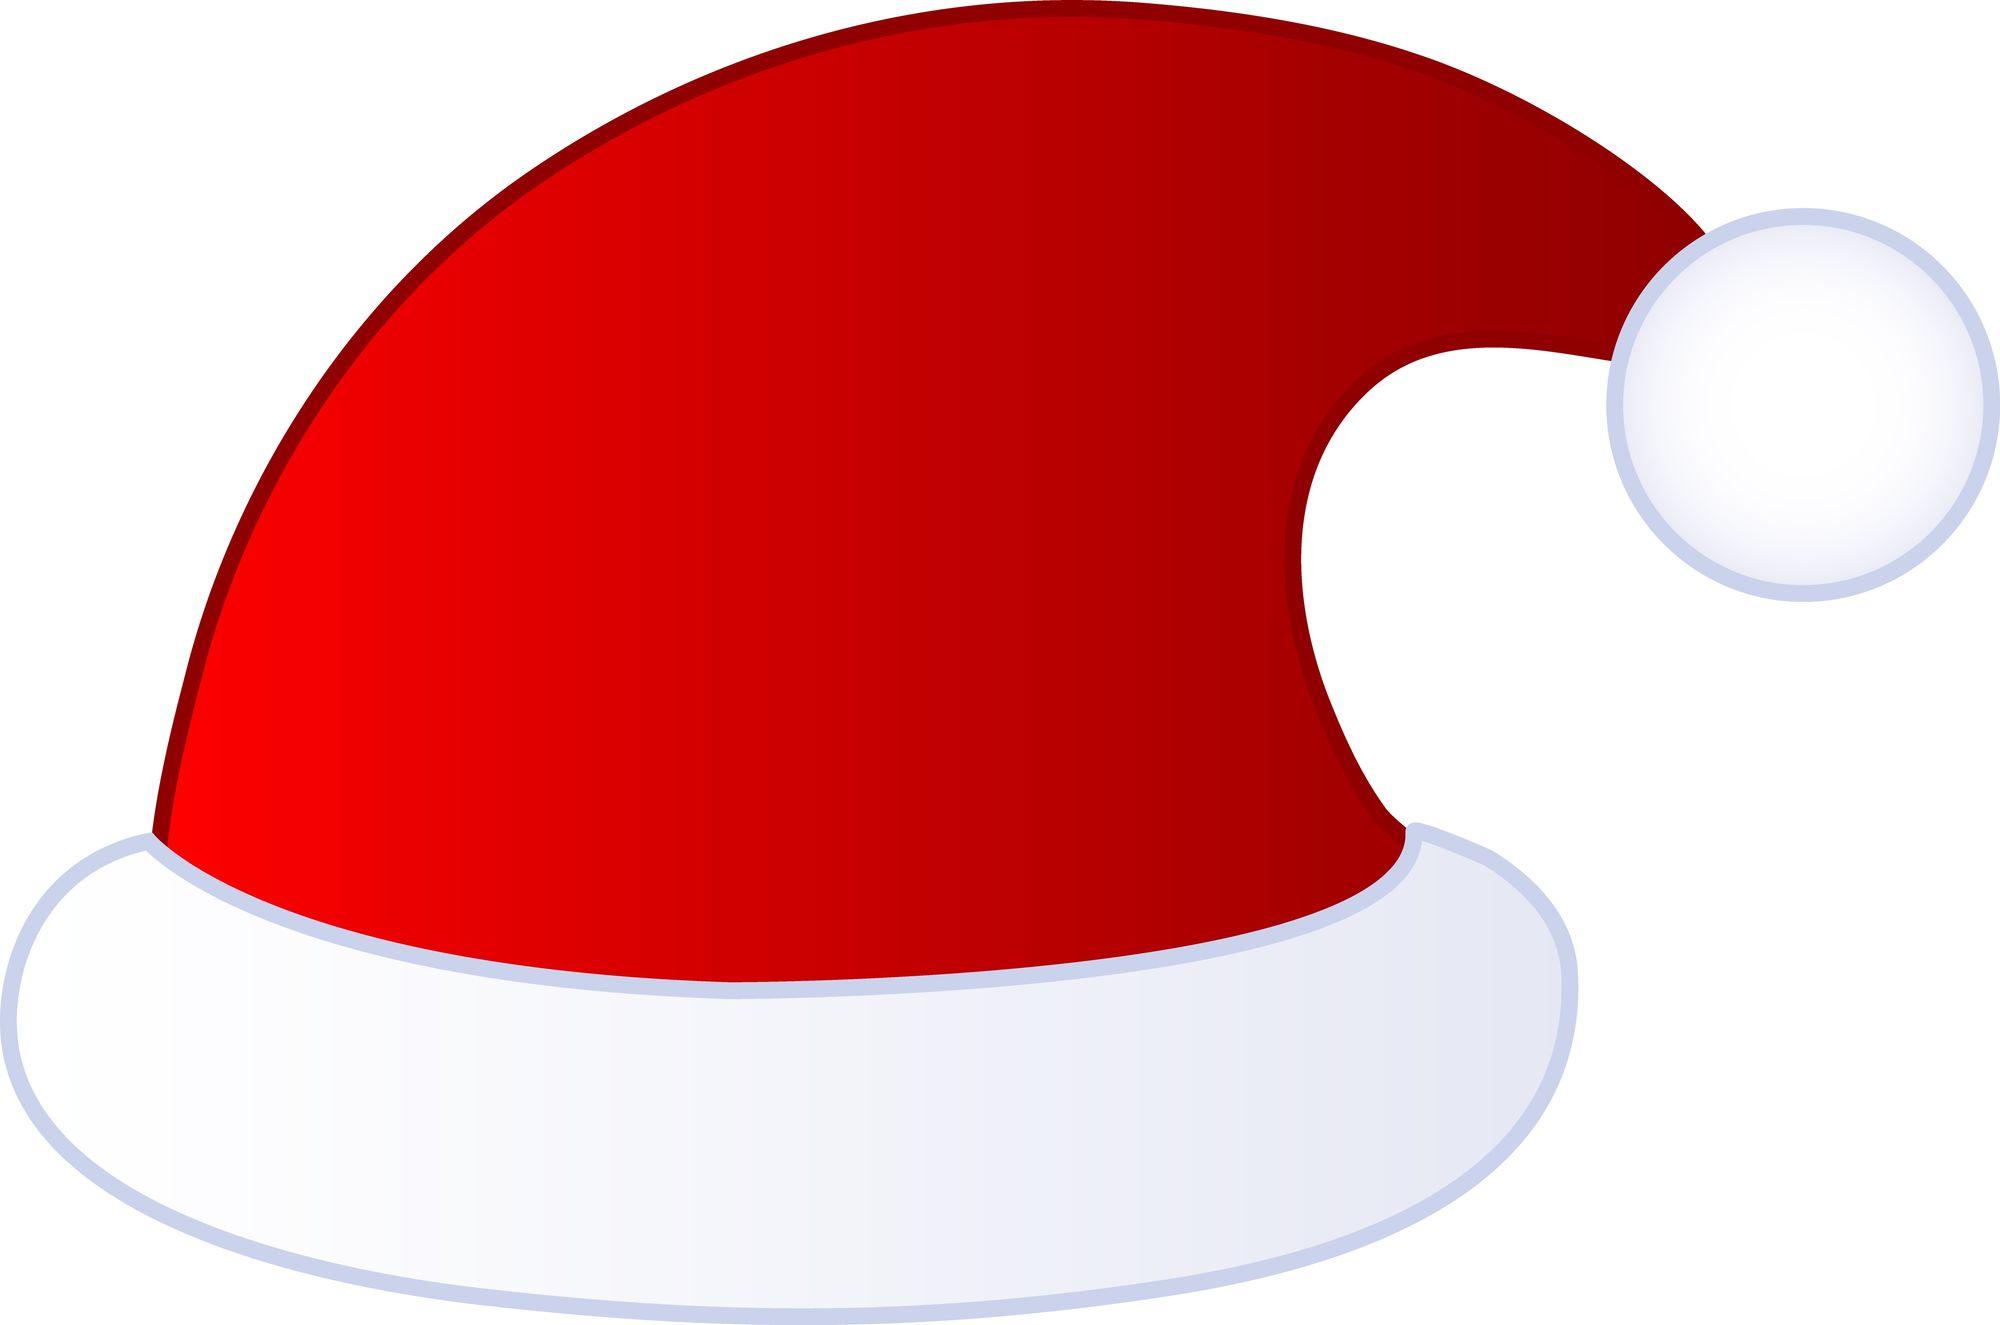 Camo clipart santa Camouflage hat Snow Cliparts santa